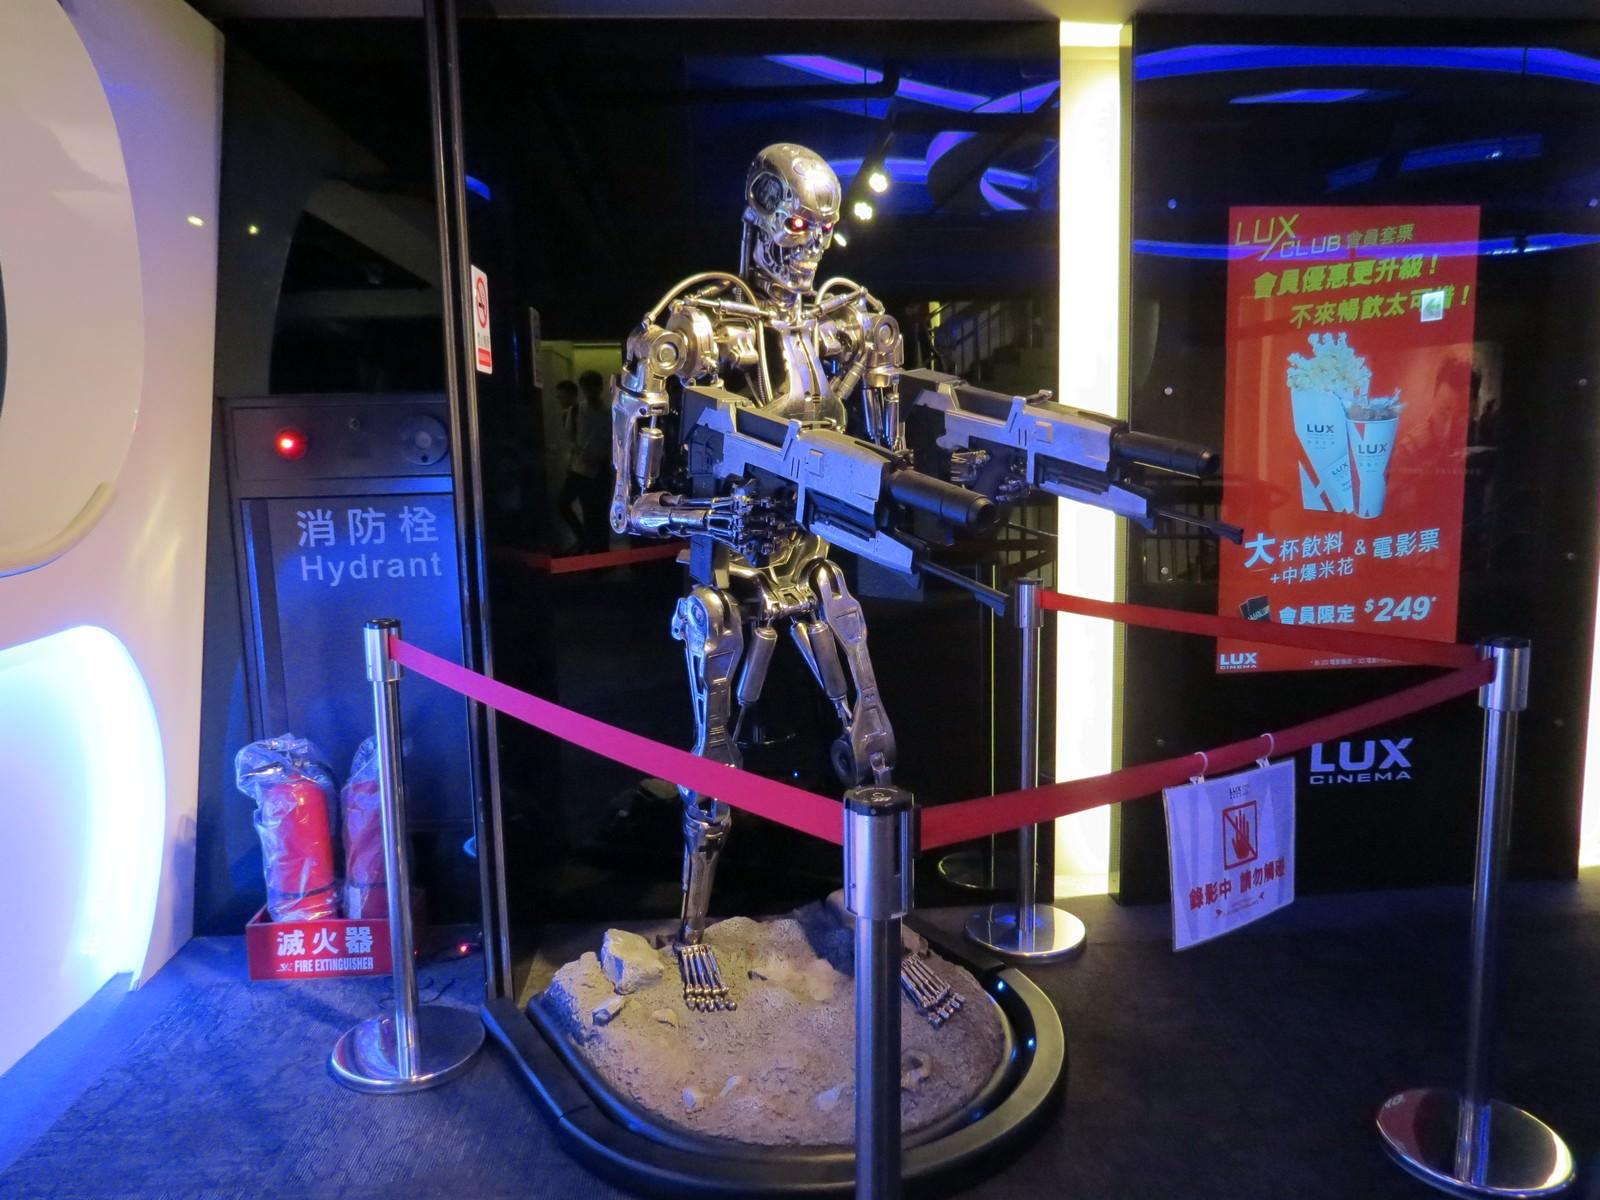 Movie, The Terminator(美國, 1985年) / 魔鬼終結者(台灣) / 未來戰士(香港) / 终结者(網路), 電影宣傳模型